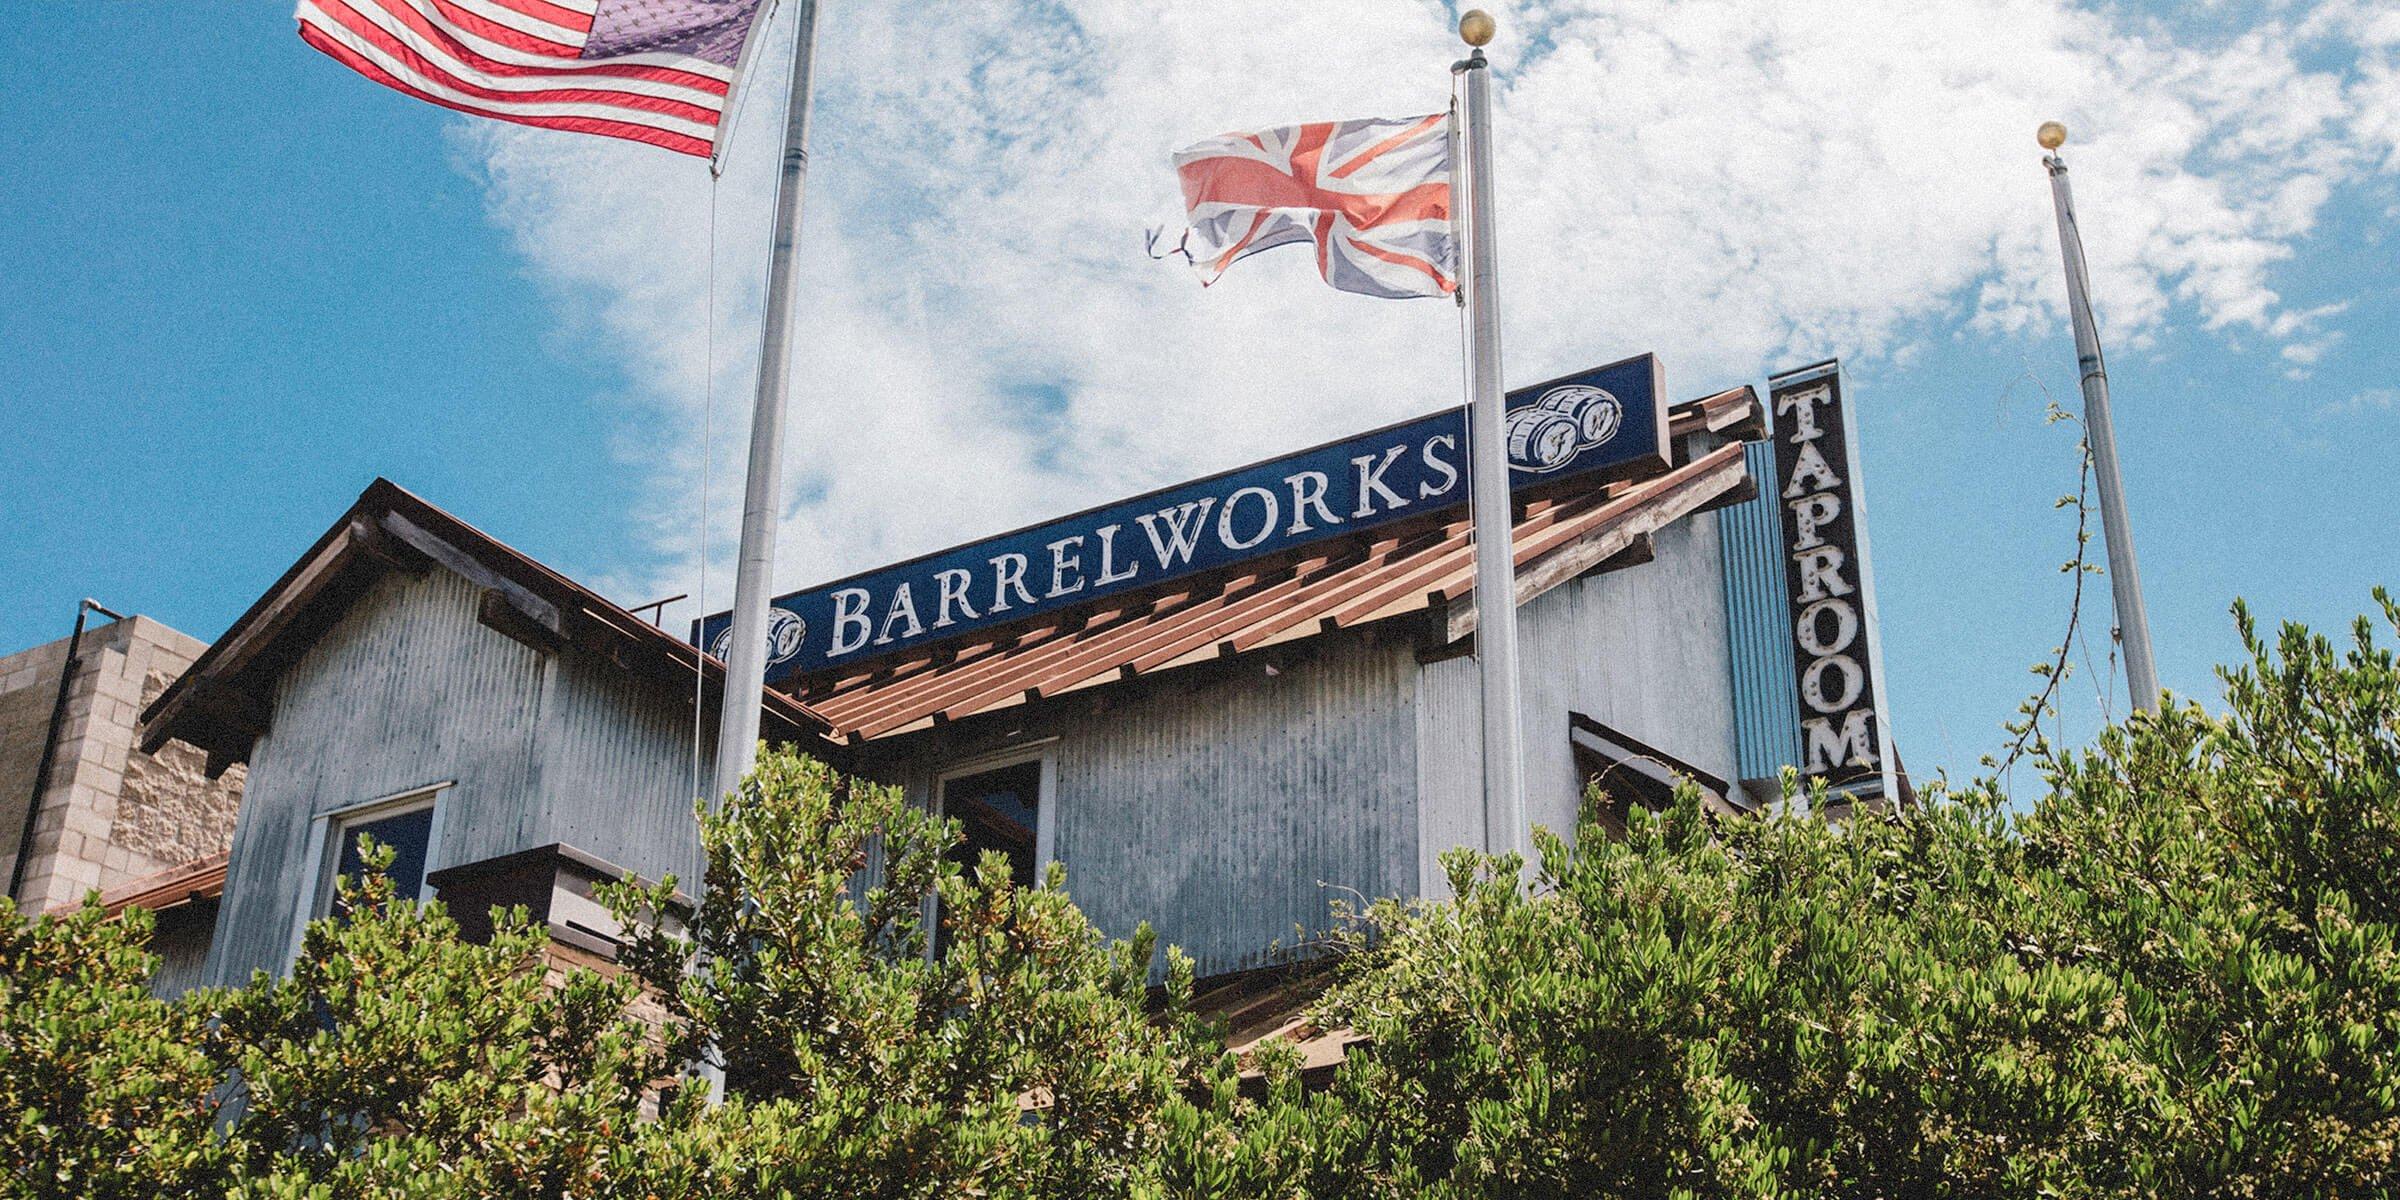 Outside the Buellton Taproom & Barrelworks of Firestone Walker Brewing Company in Buellton, California